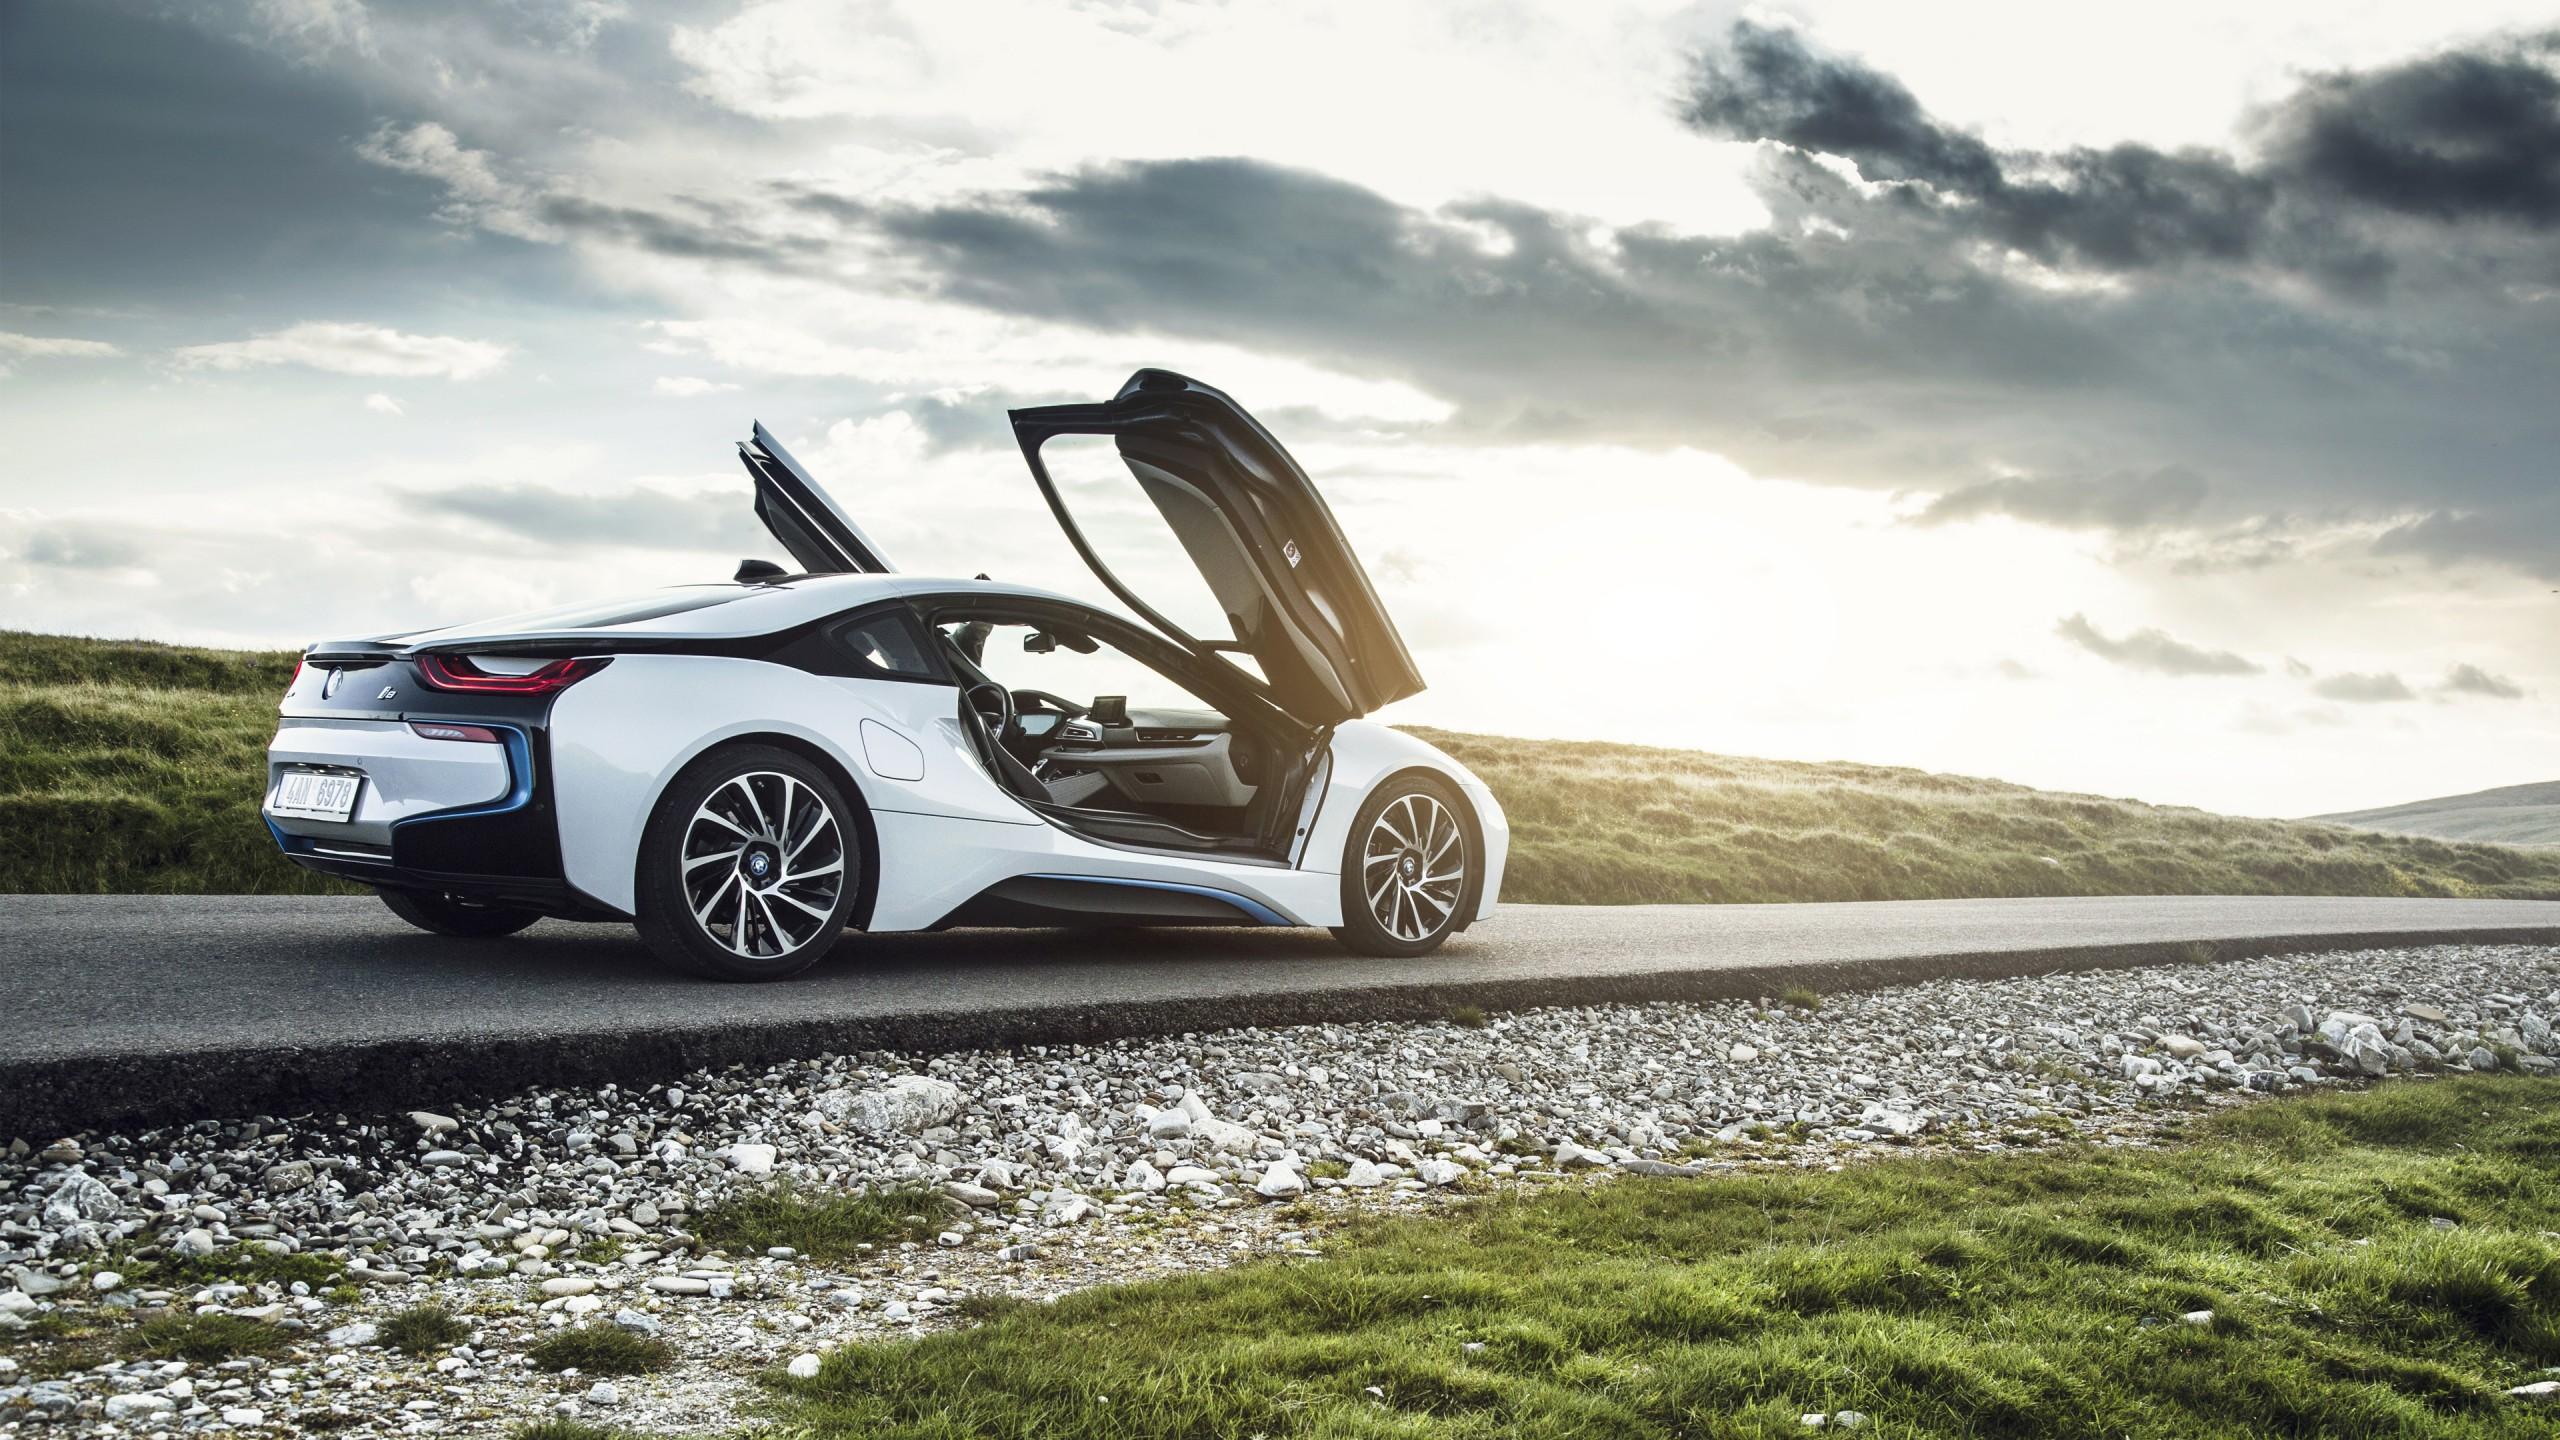 Bmw I8 Car Concept 4k Hd Desktop Wallpaper For 4k Ultra Hd: BMW I8 Side View Wallpaper